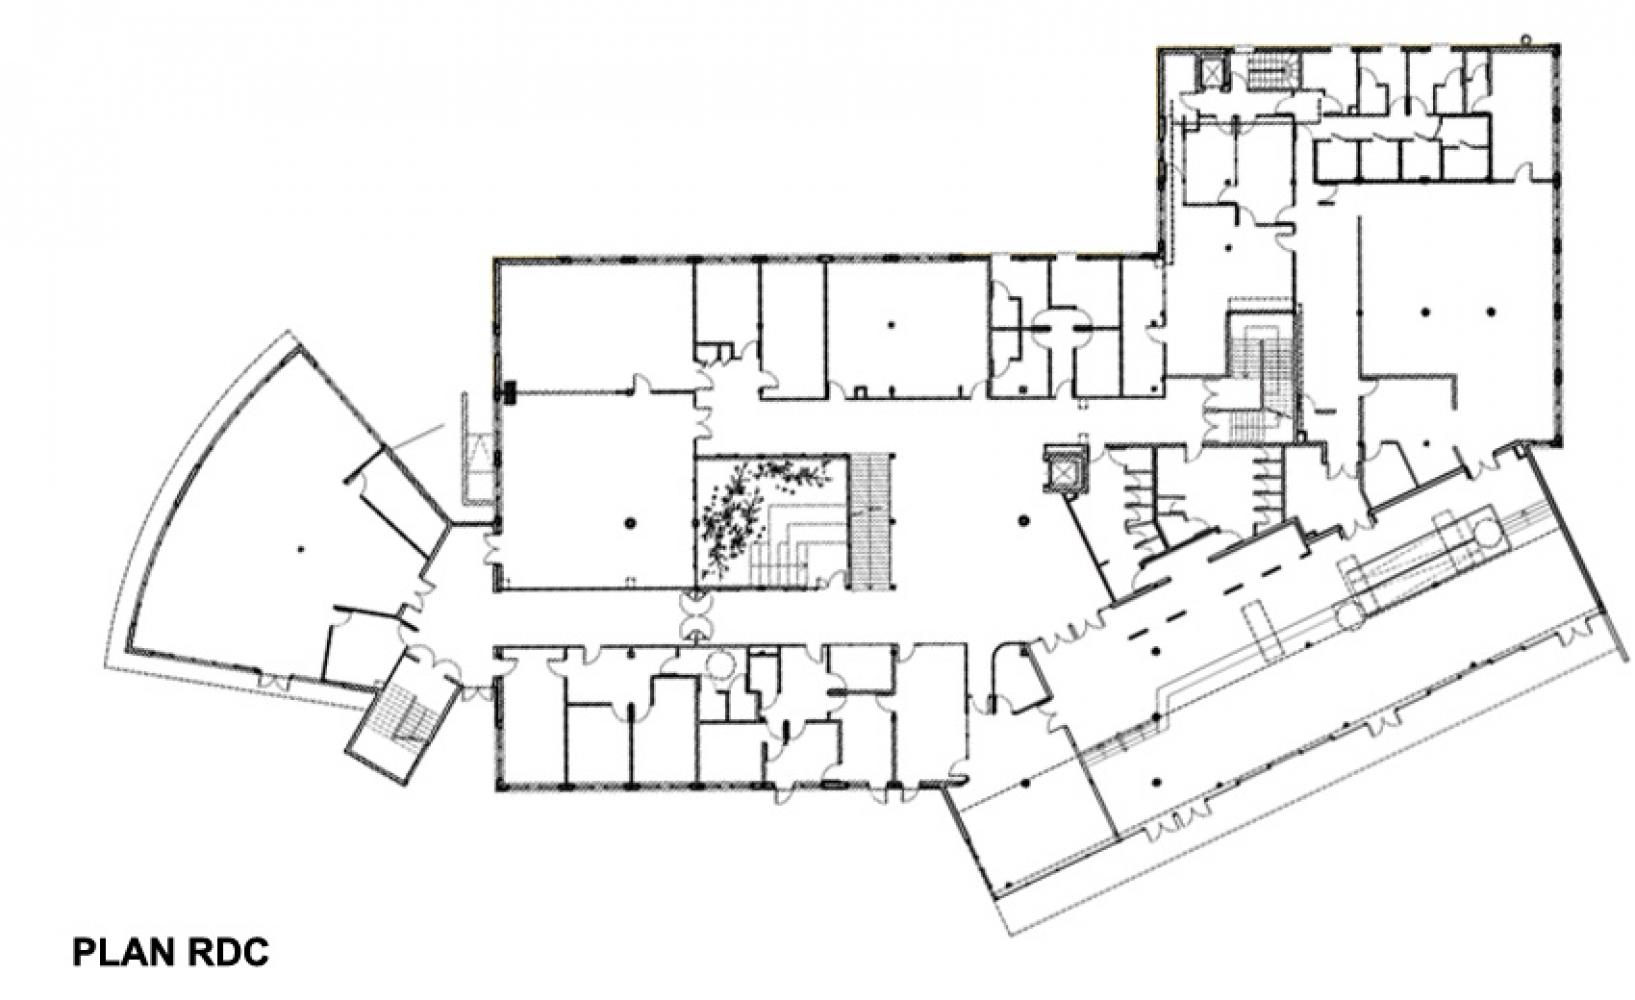 zligu---04b Pascale SEURIN Architecte - Pascale SEURIN Architecte